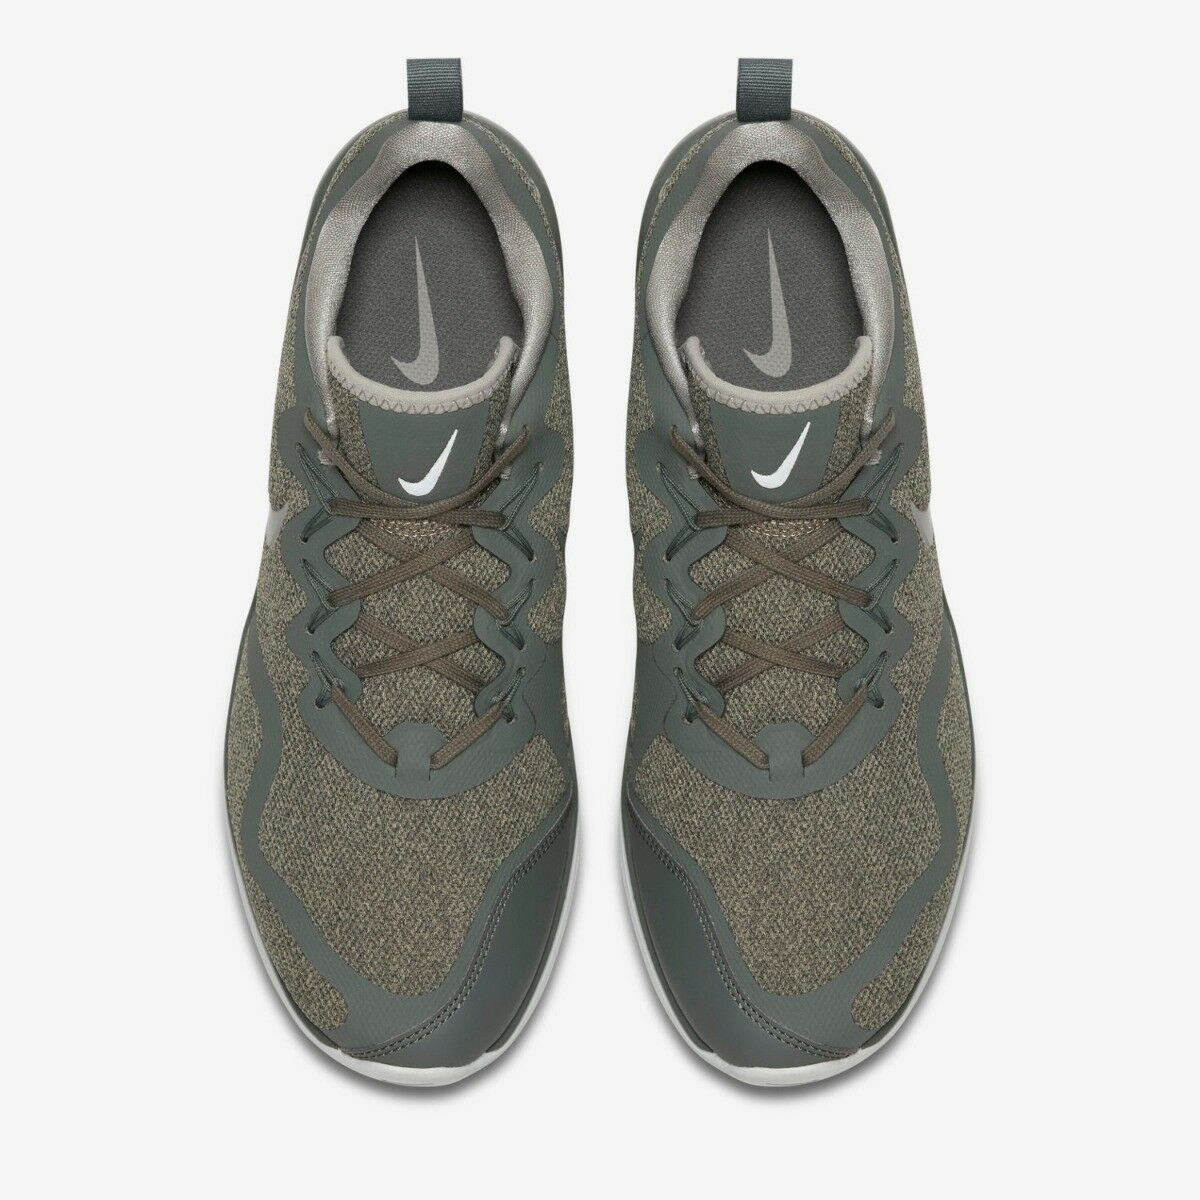 Nike 7 Air Max Fourrure Course Hommes Baskets River Rock 7 Nike - 11 Neuf 33a8d7